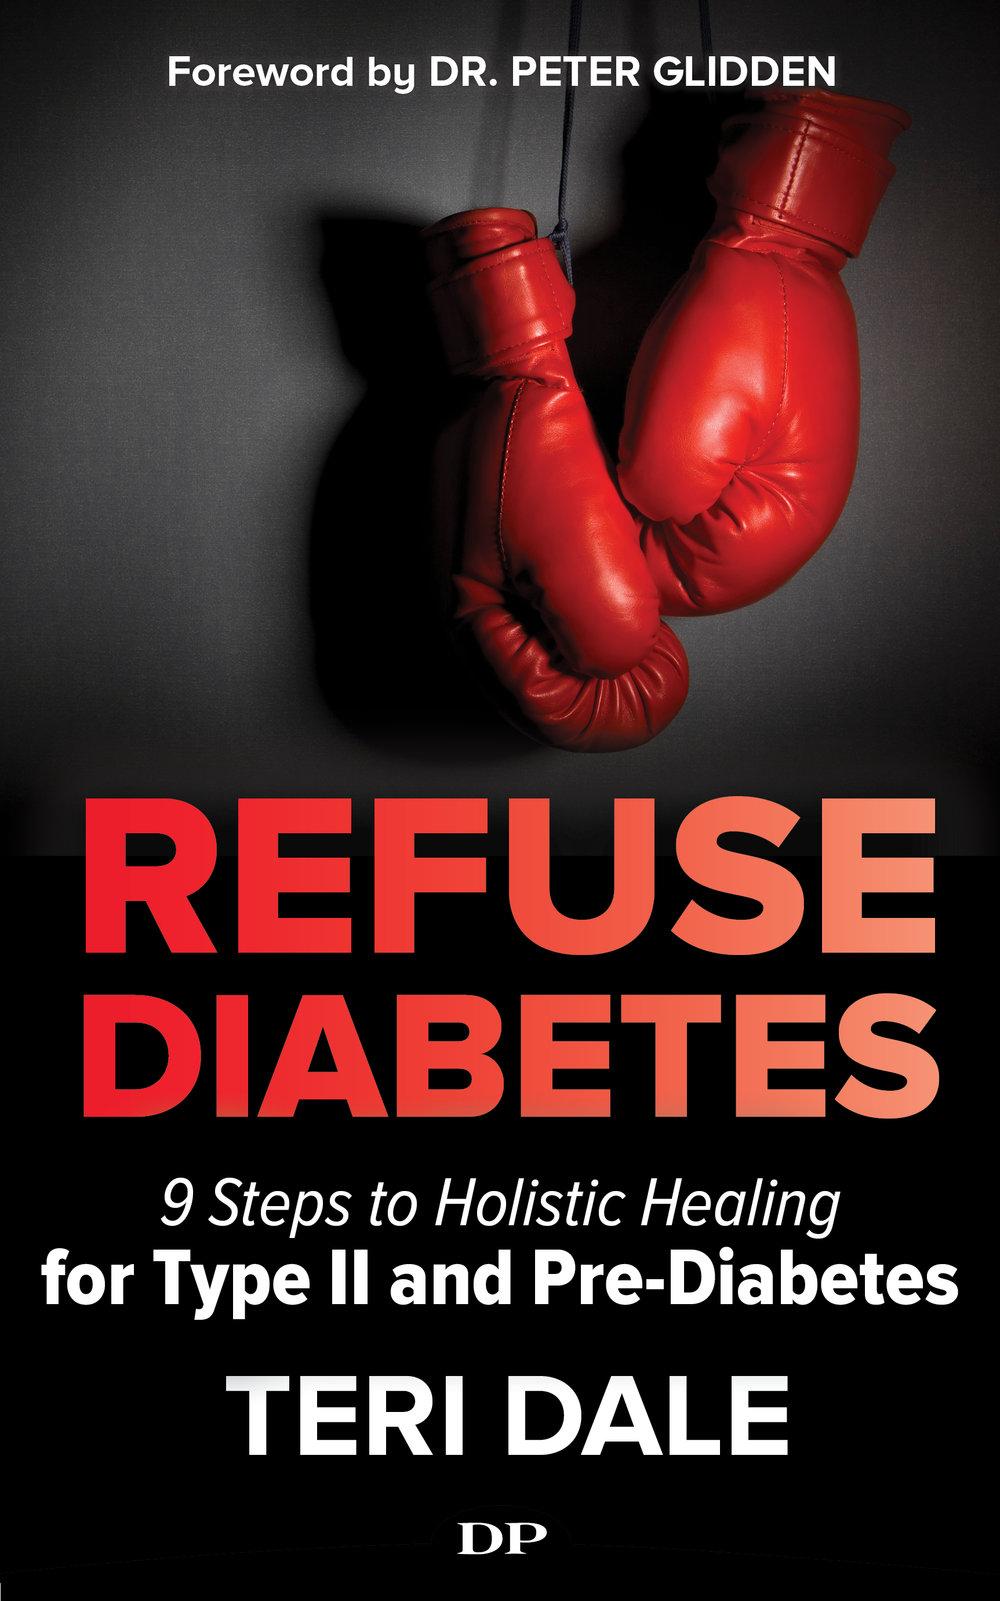 Dale_Refuse Diabetes_EBK.jpg